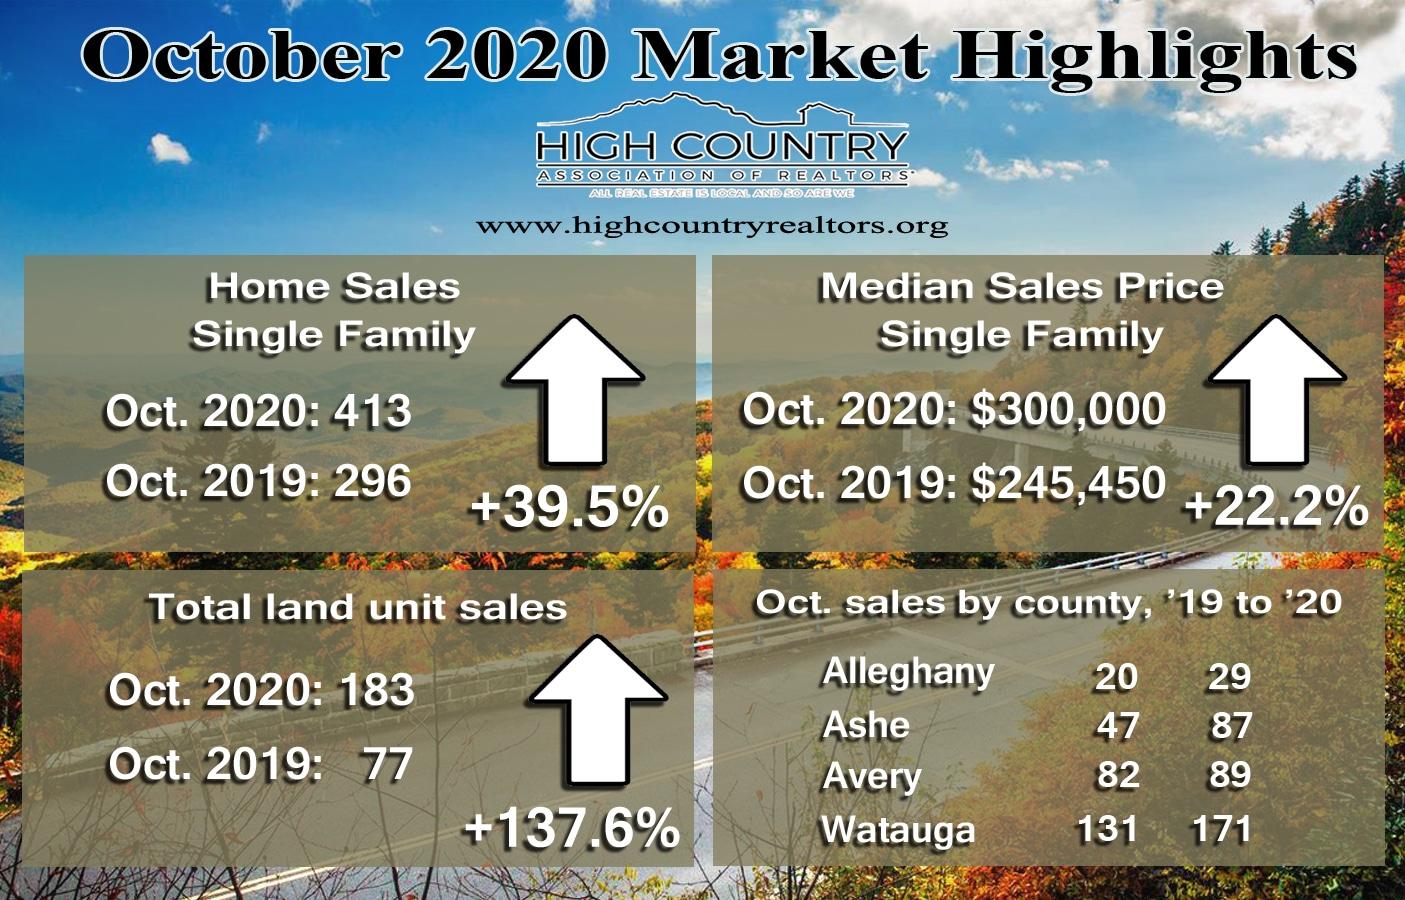 Home sales through October surpass 2019